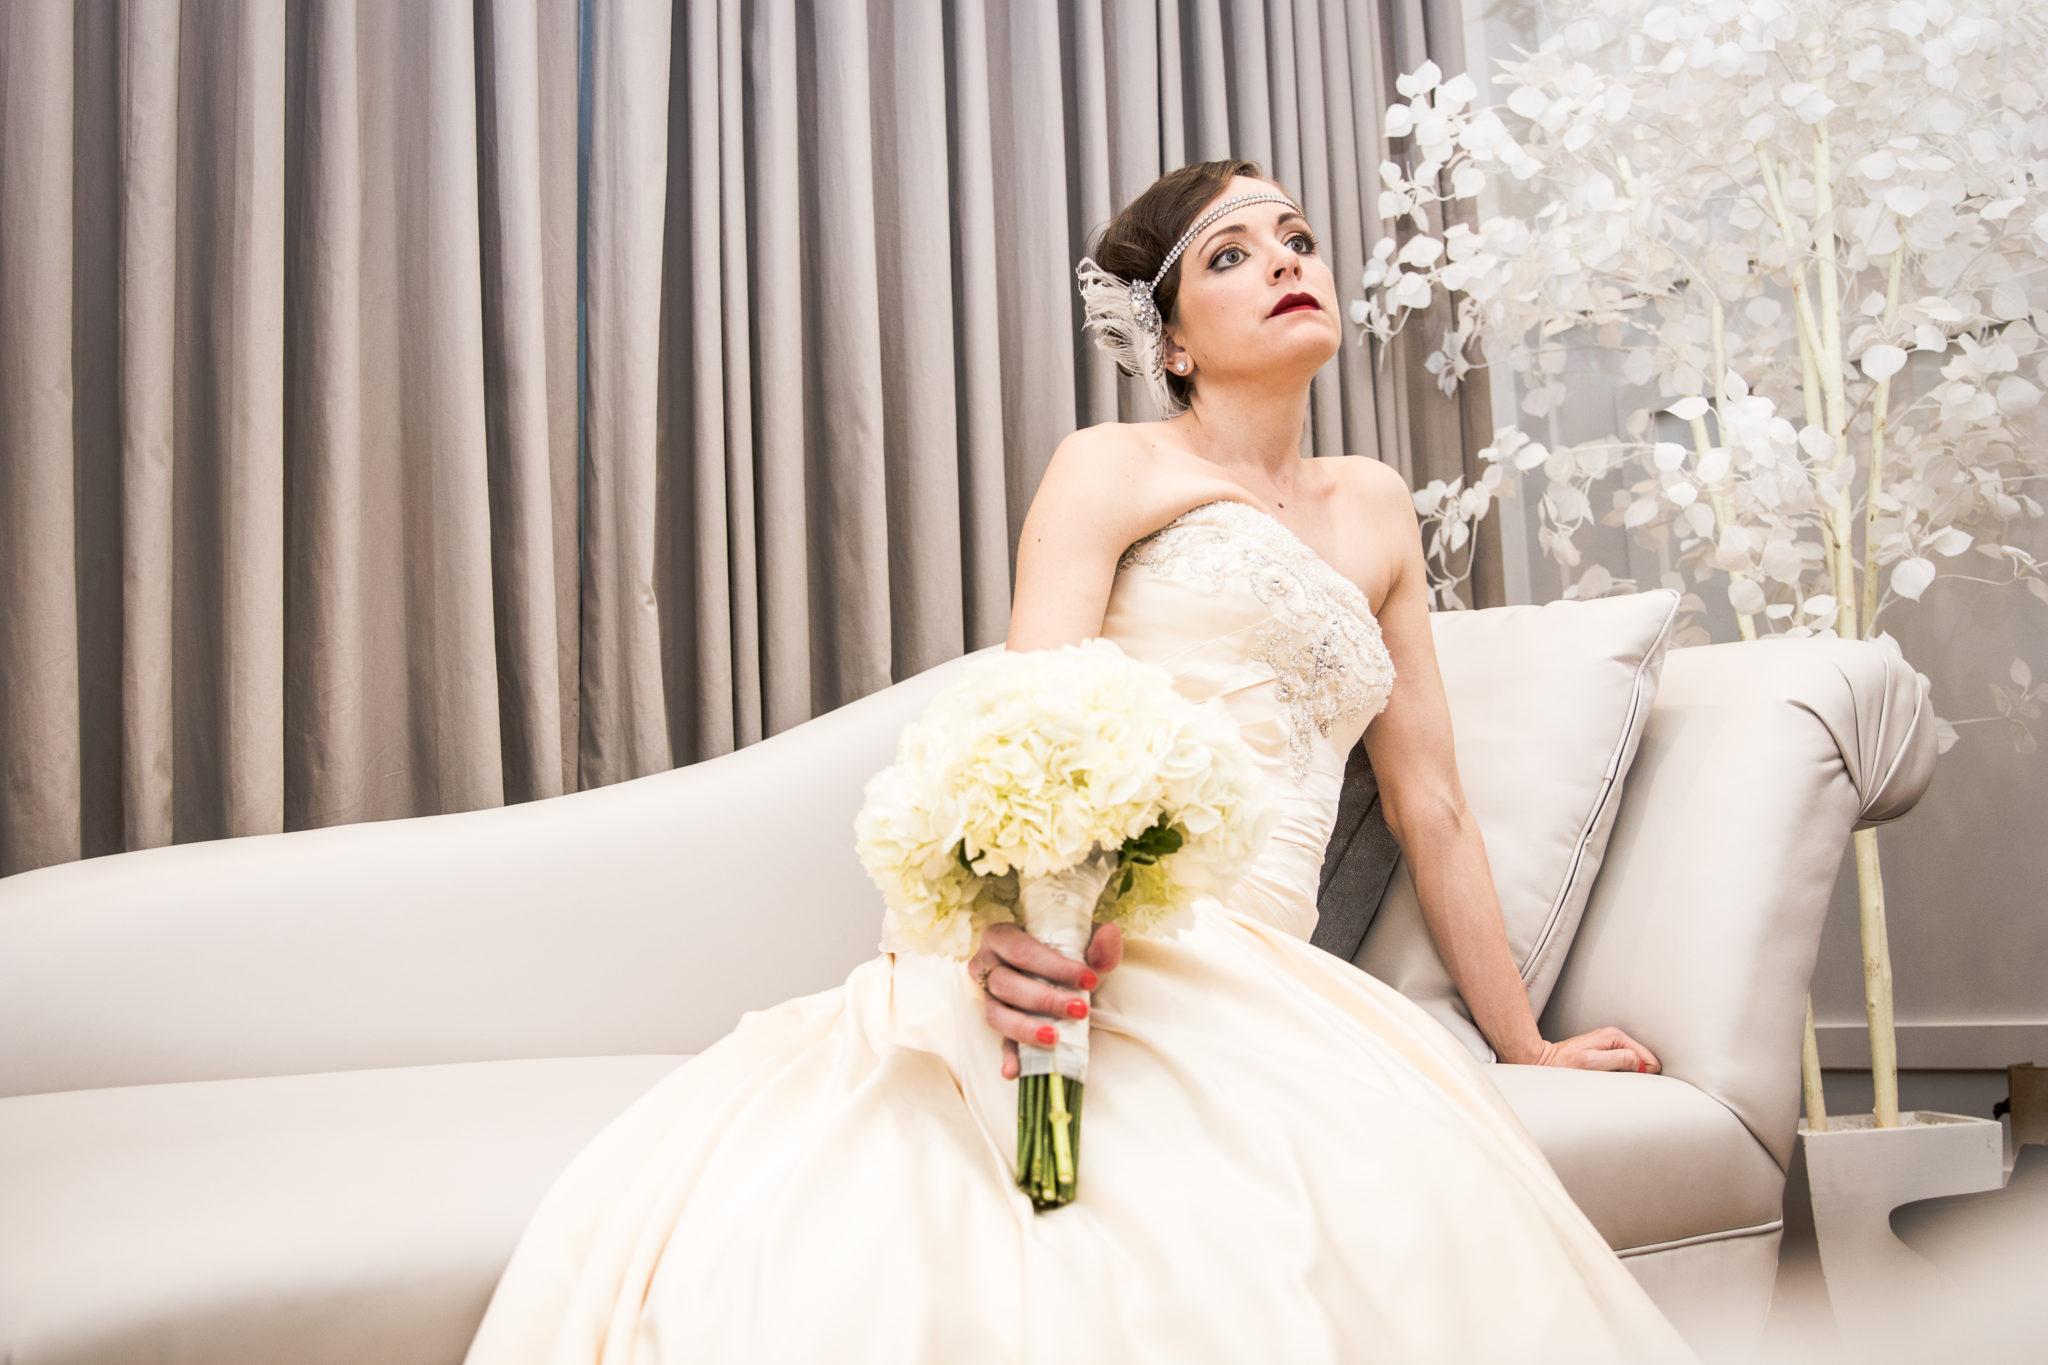 Danielle   Ryan wedding photo album highlight Ryan Hender photography